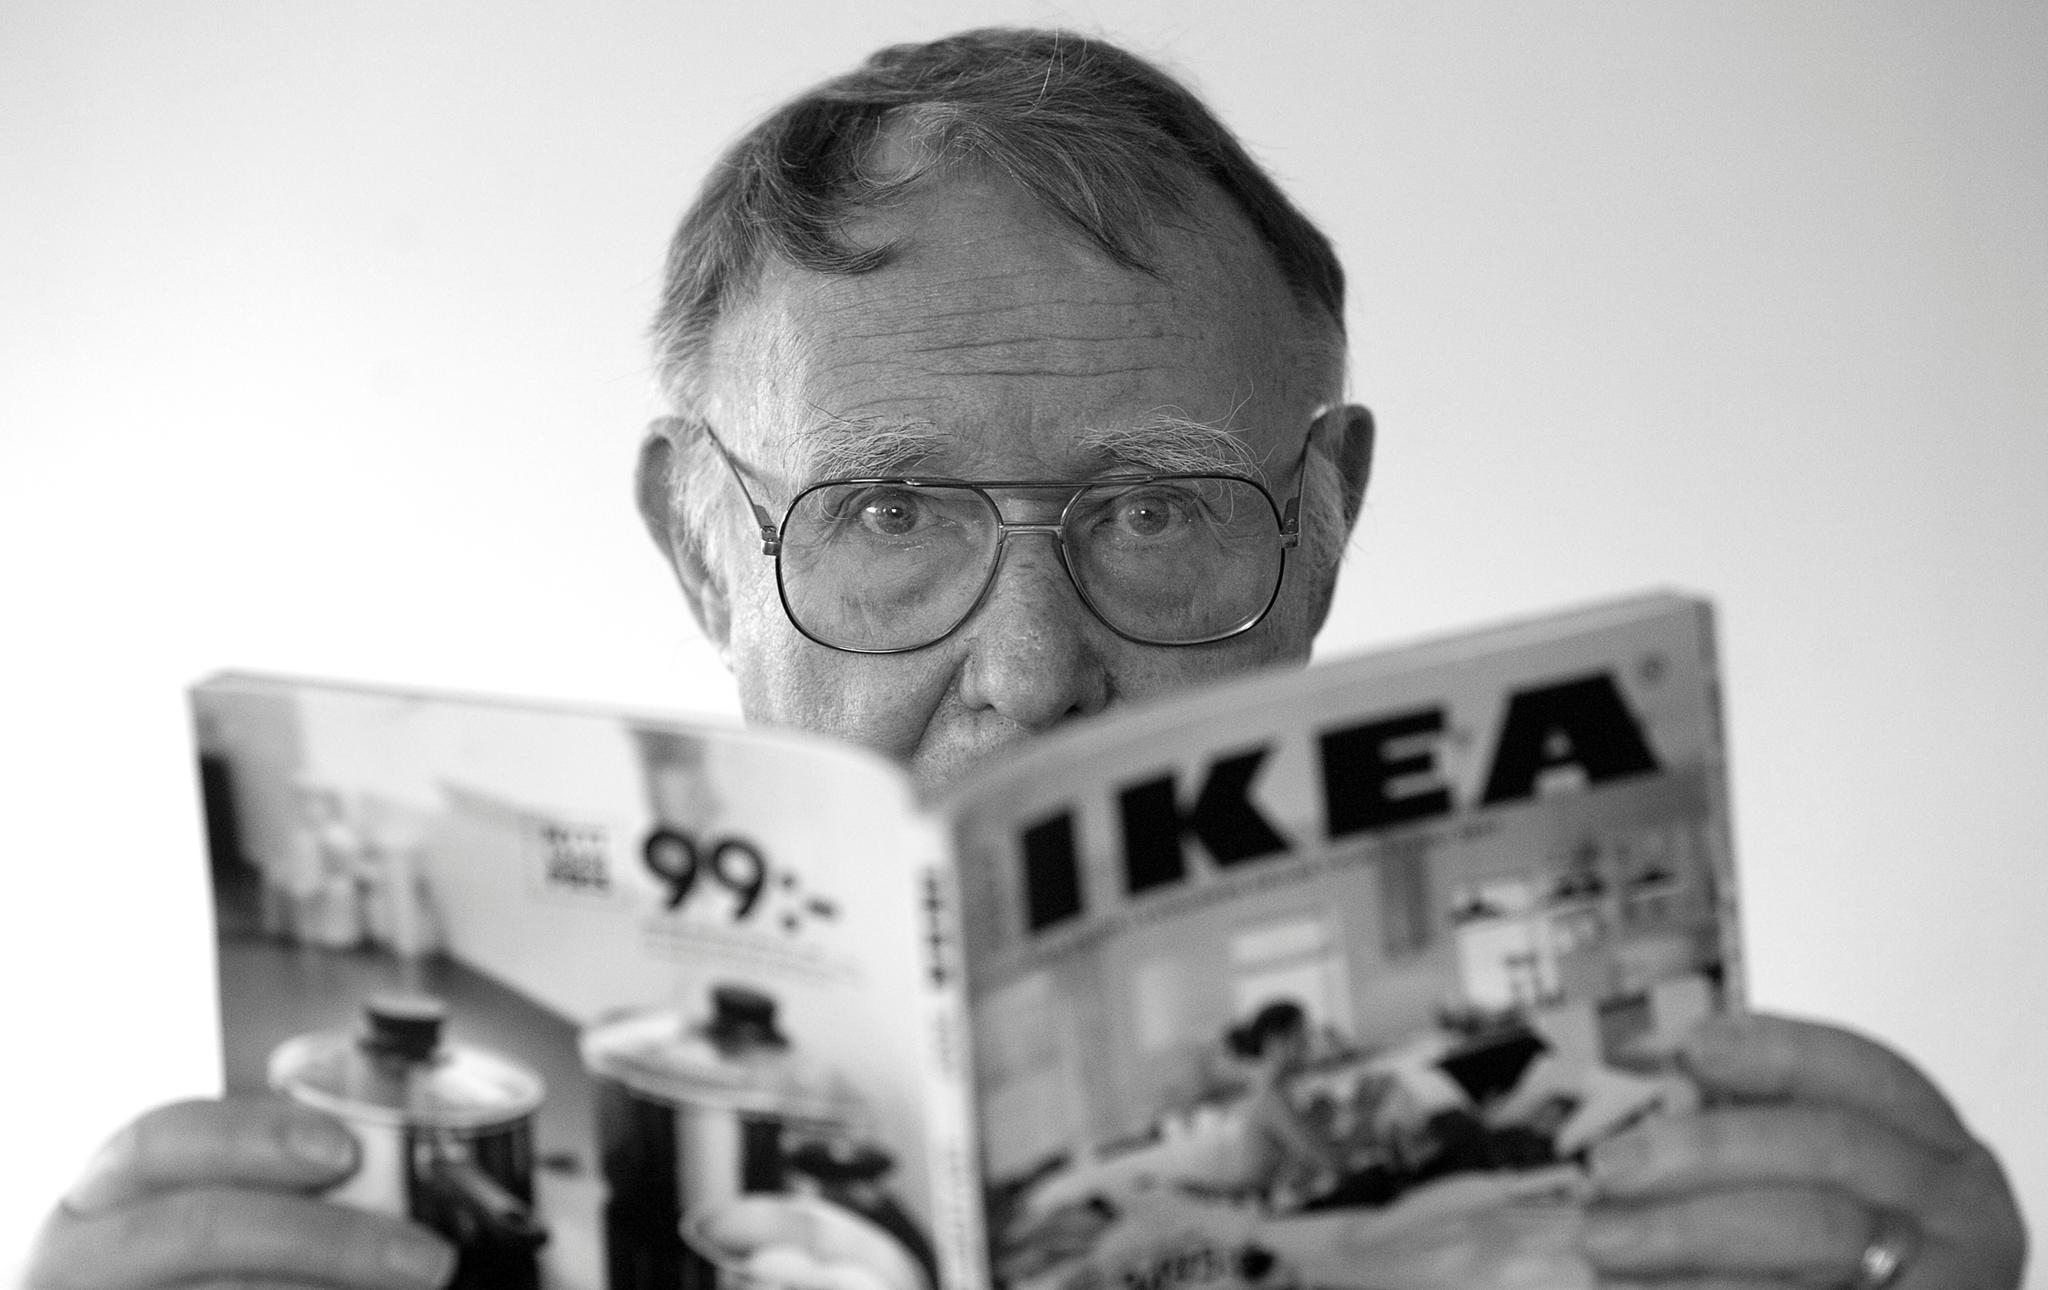 Möbel-Mogul IKEA-Gründer Ingvar Kamprad ist tot